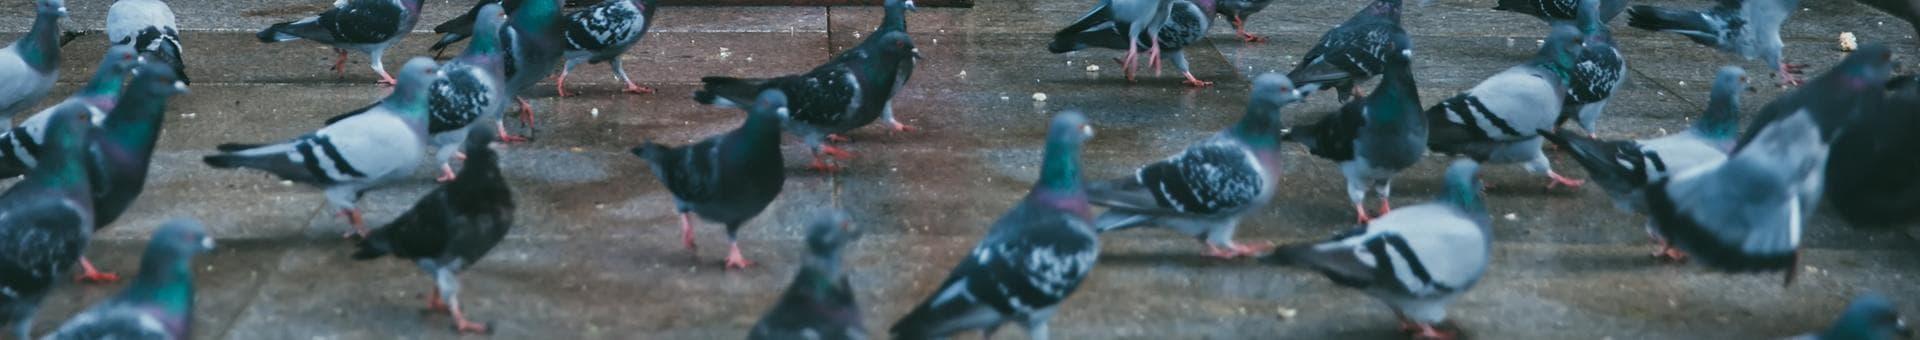 Pigeon Netting London  Bird Pest Control London Regional Environmental  Services. Sm London Rodent Control